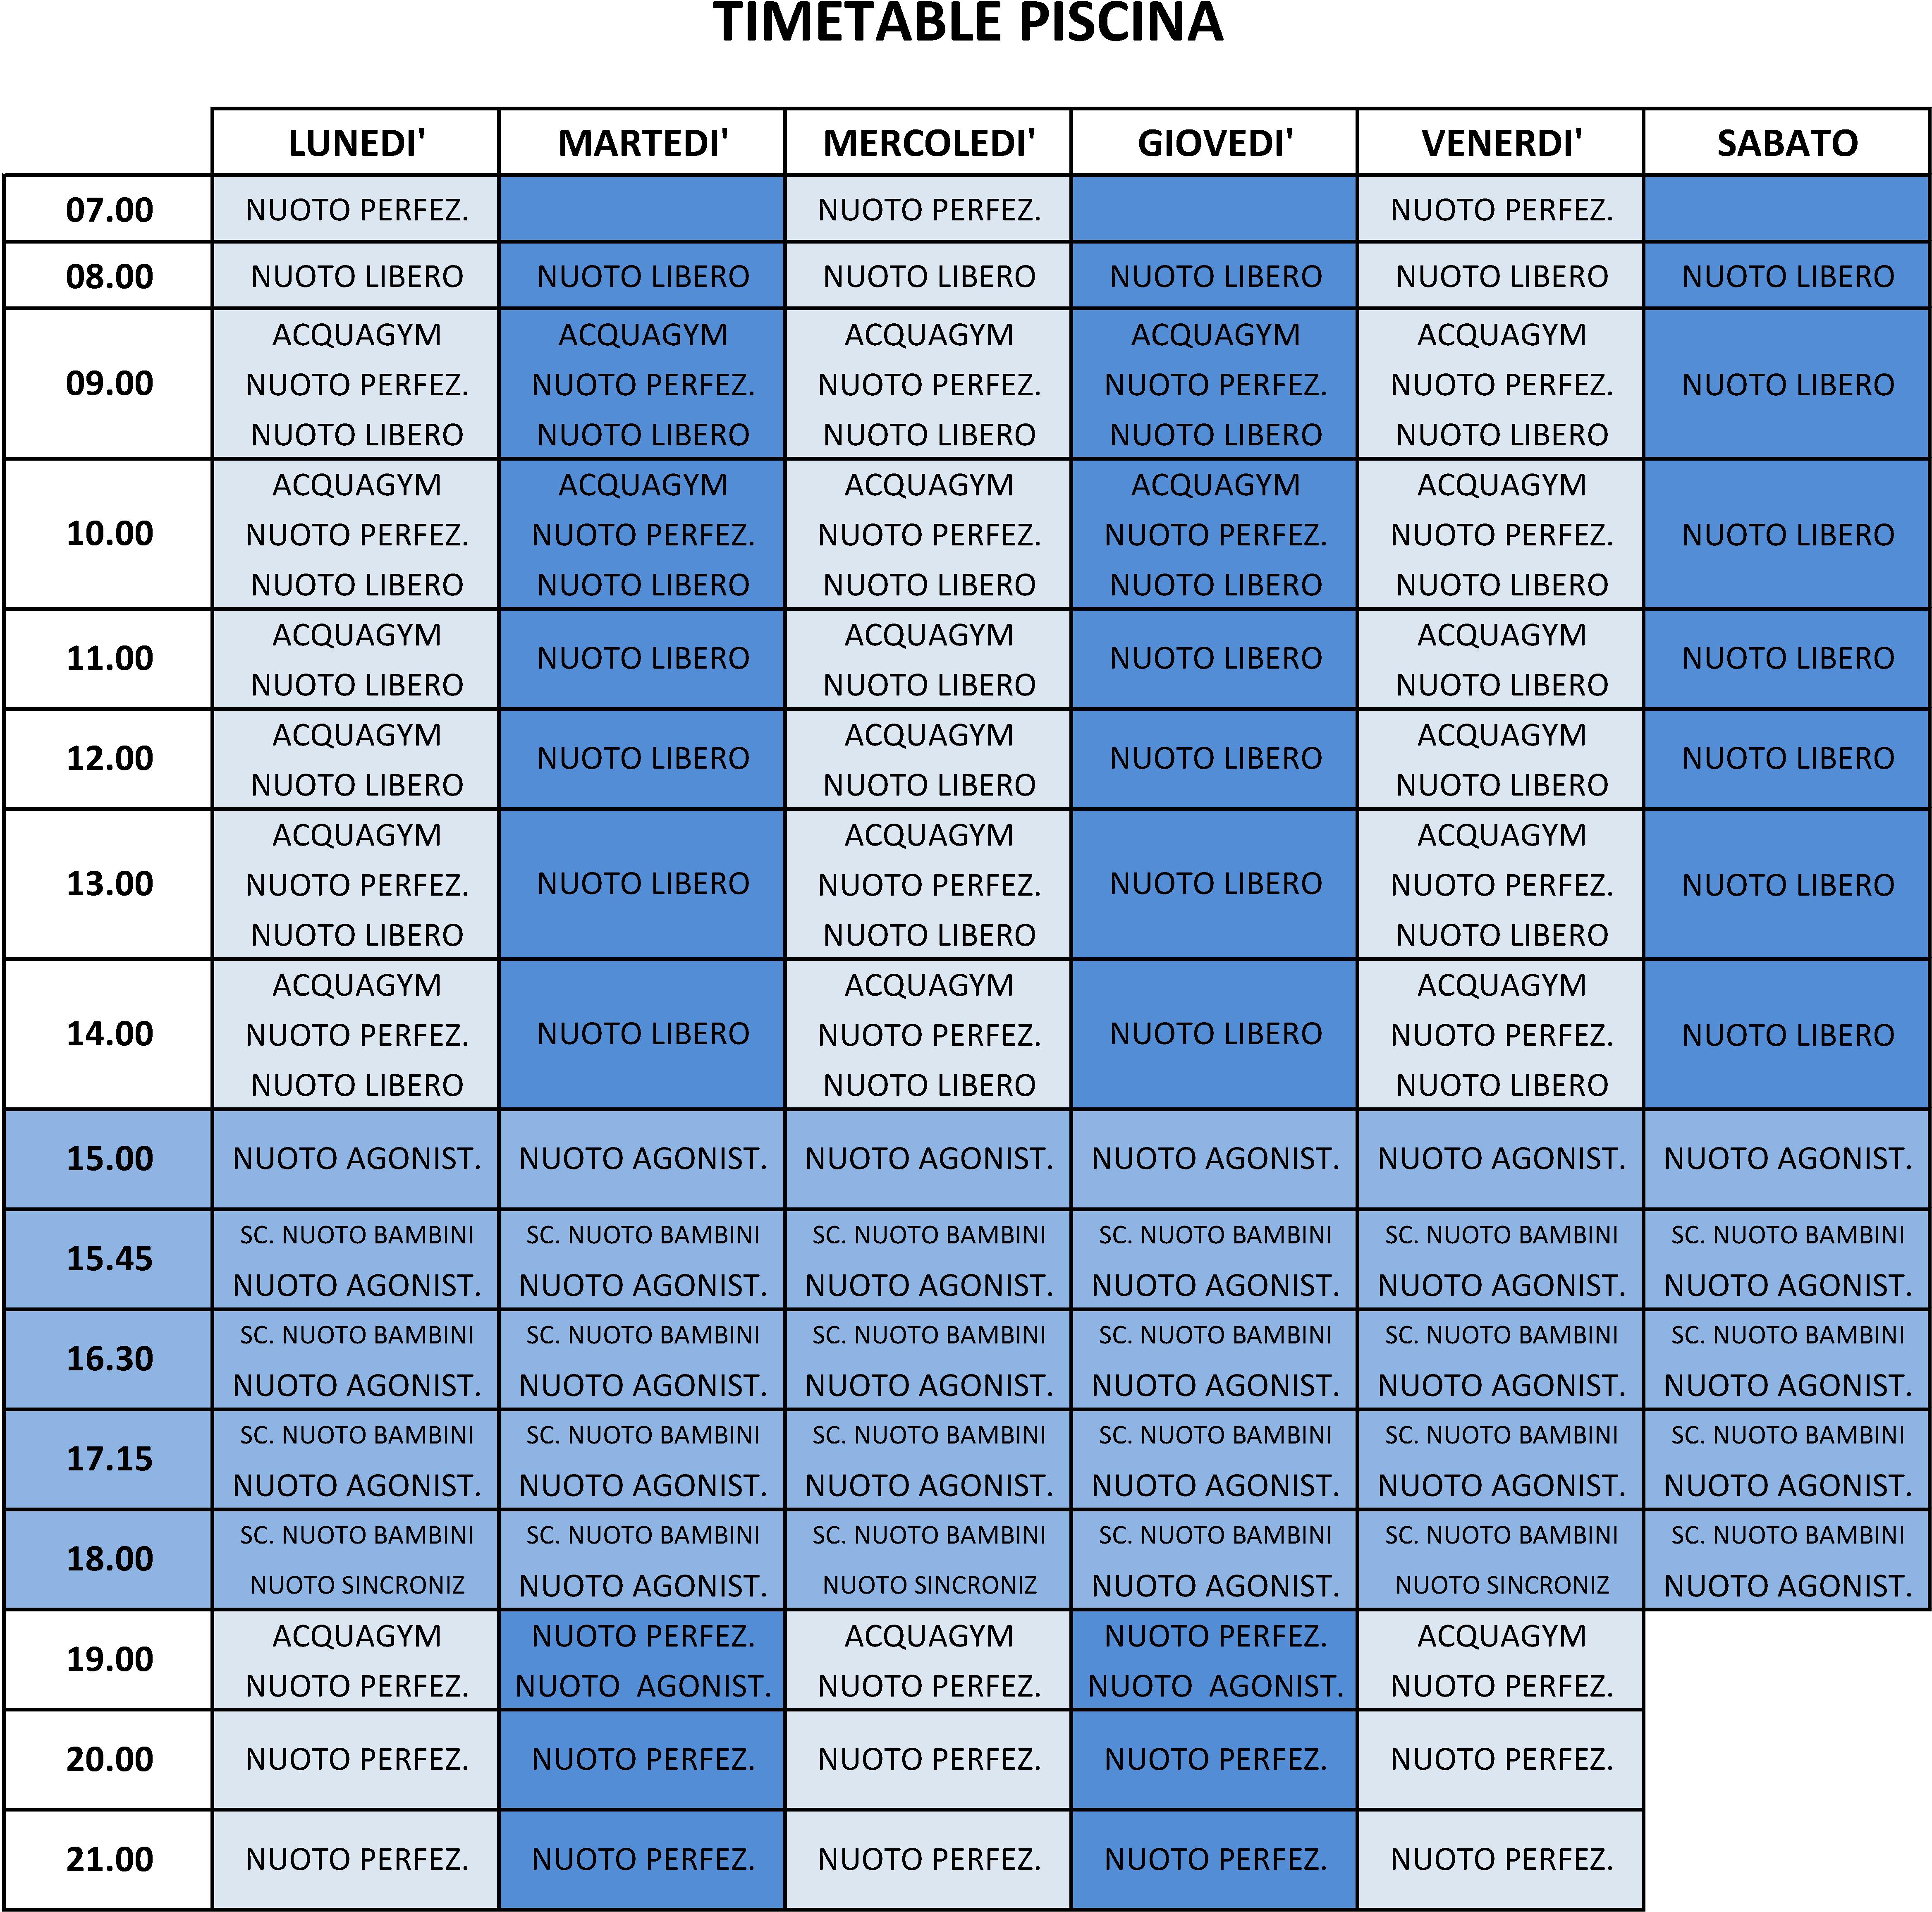 Timetable Piscina 2015